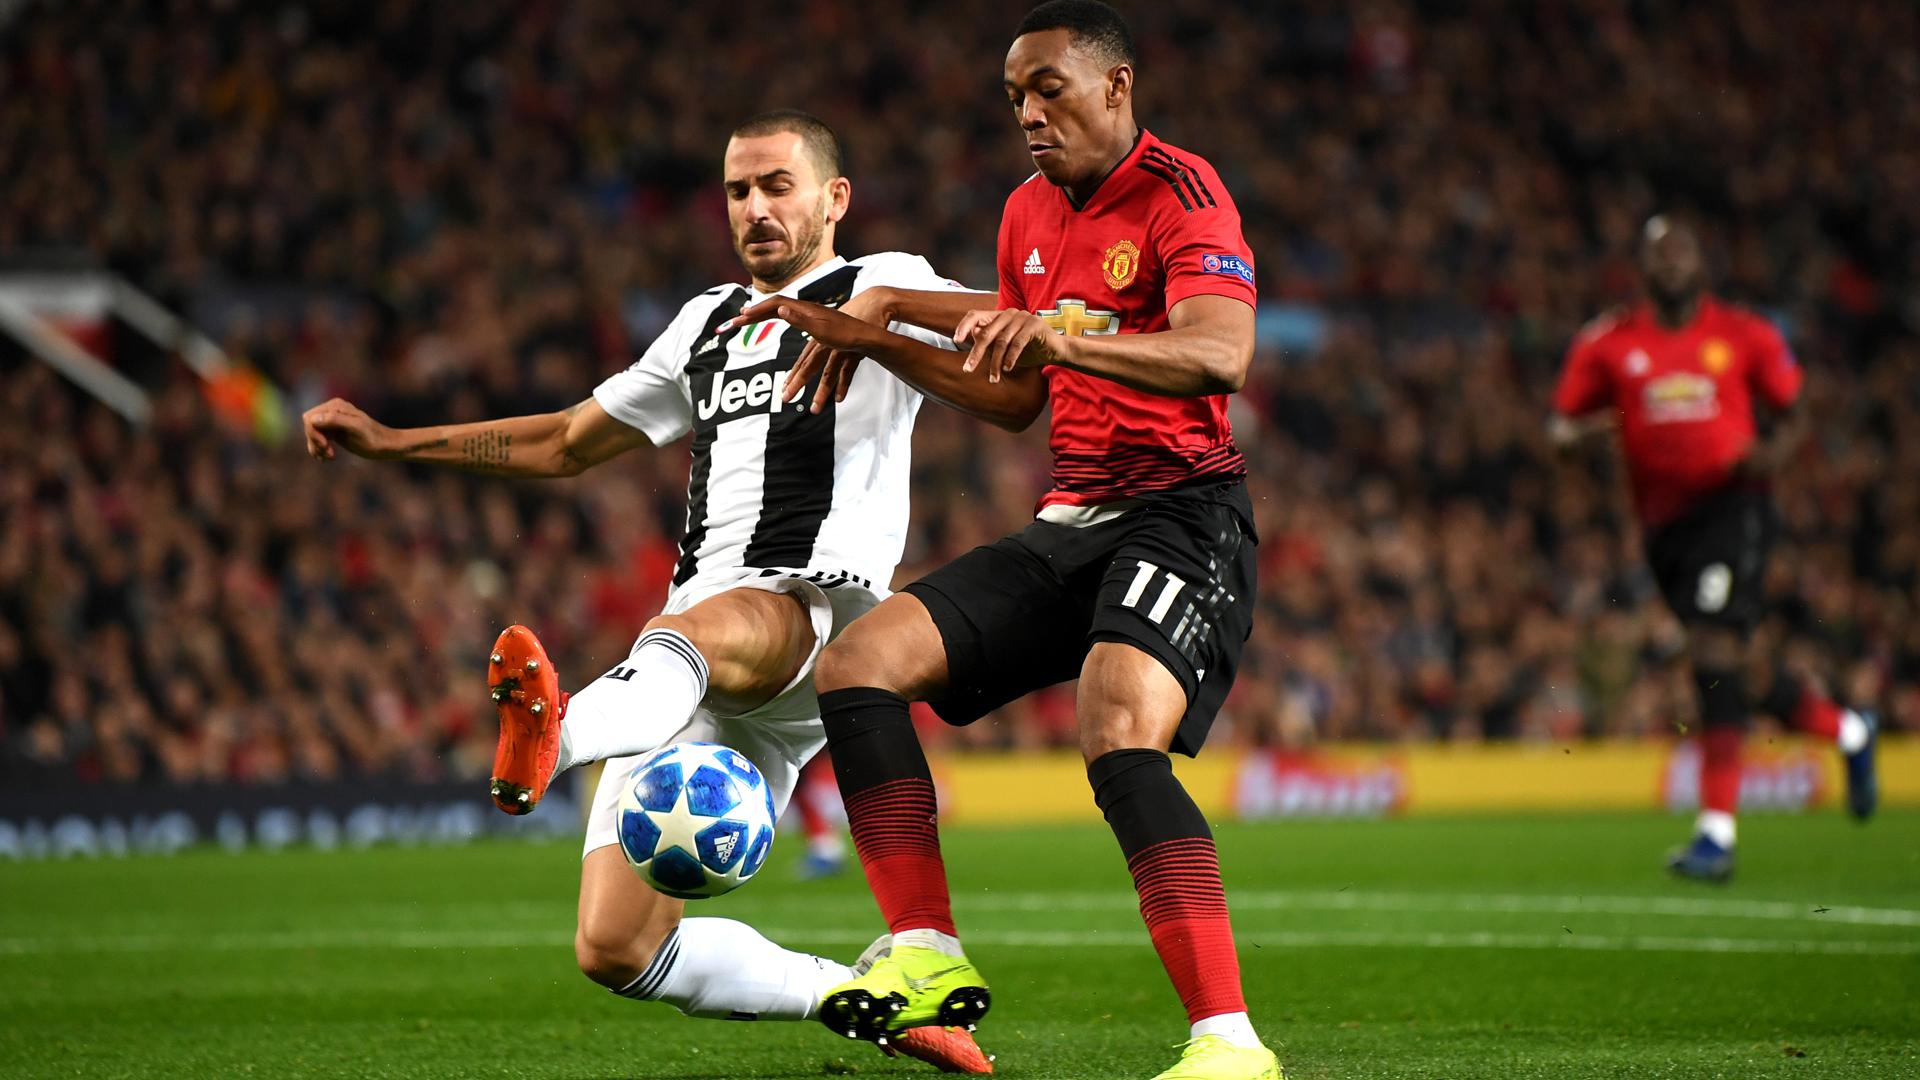 GFX Juventus Manchester United TV LIVE STREAM